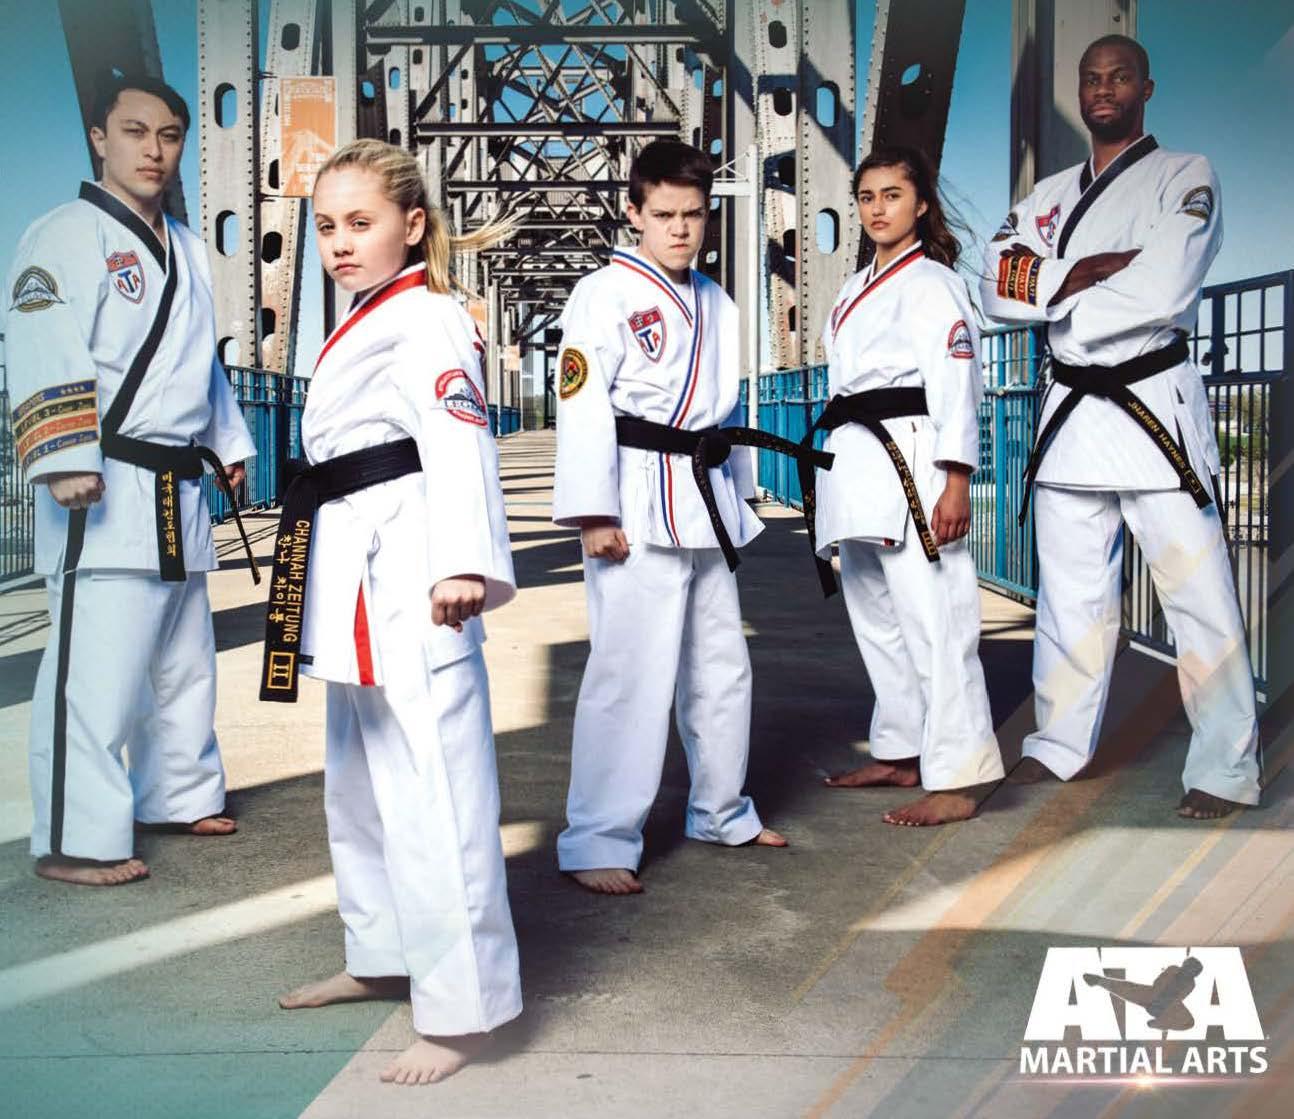 summer, martial arts, invictus, family